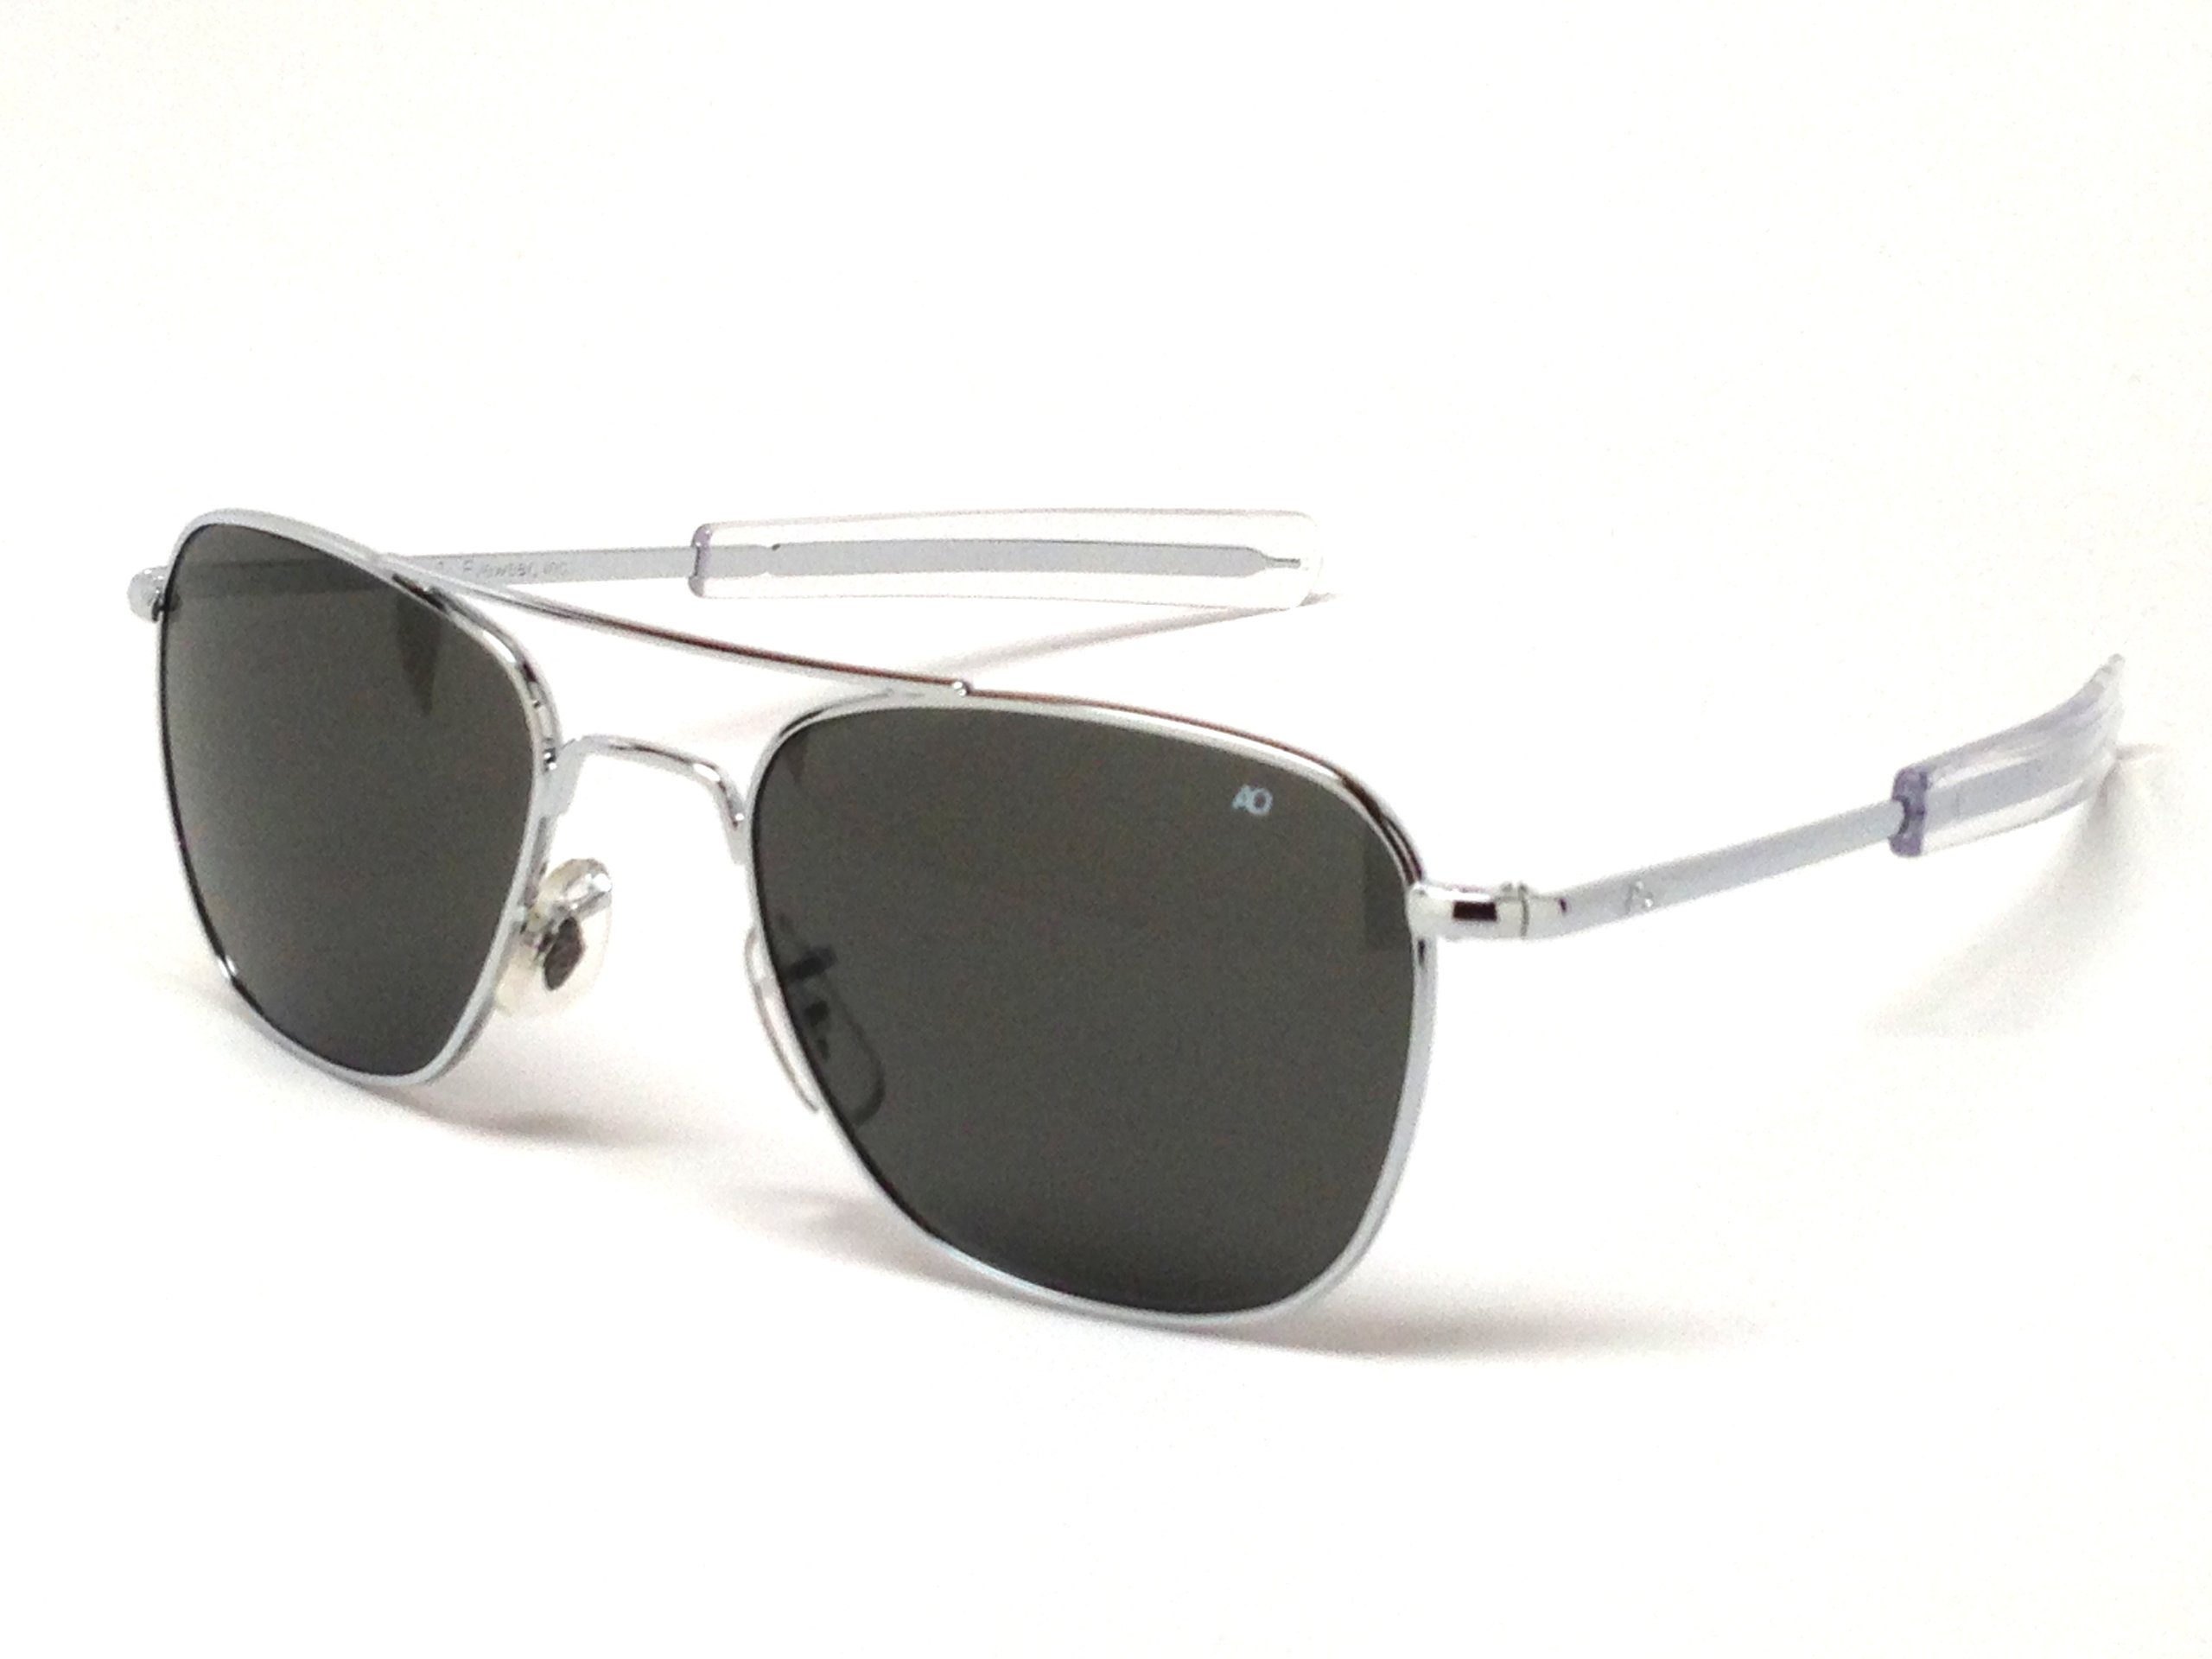 American Optical Pilot Aviator Sunglasses 55 mm Shiny Silver